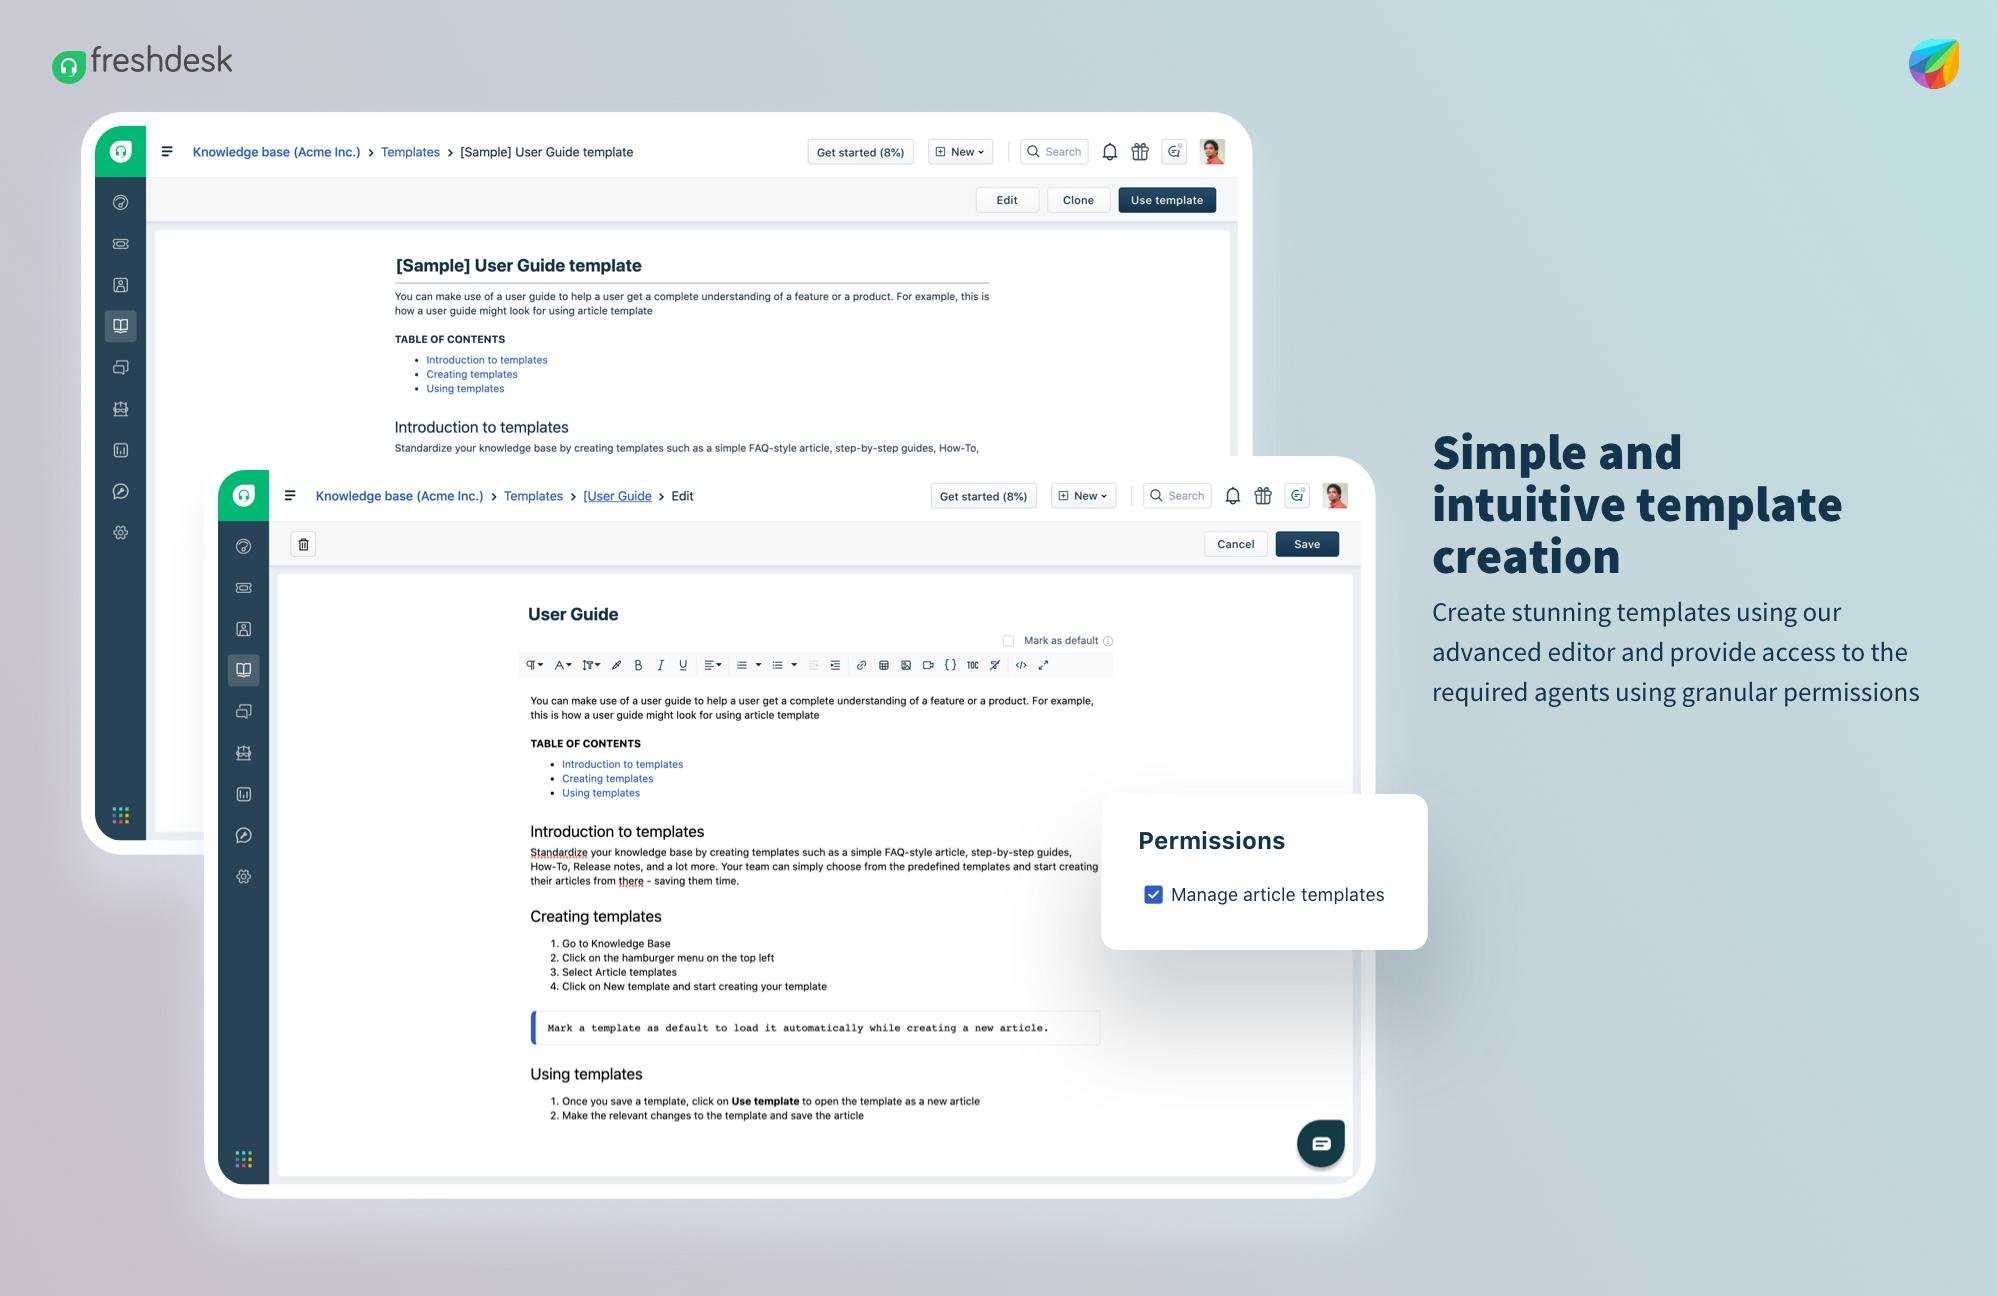 Create Article Templates in Freshdesk